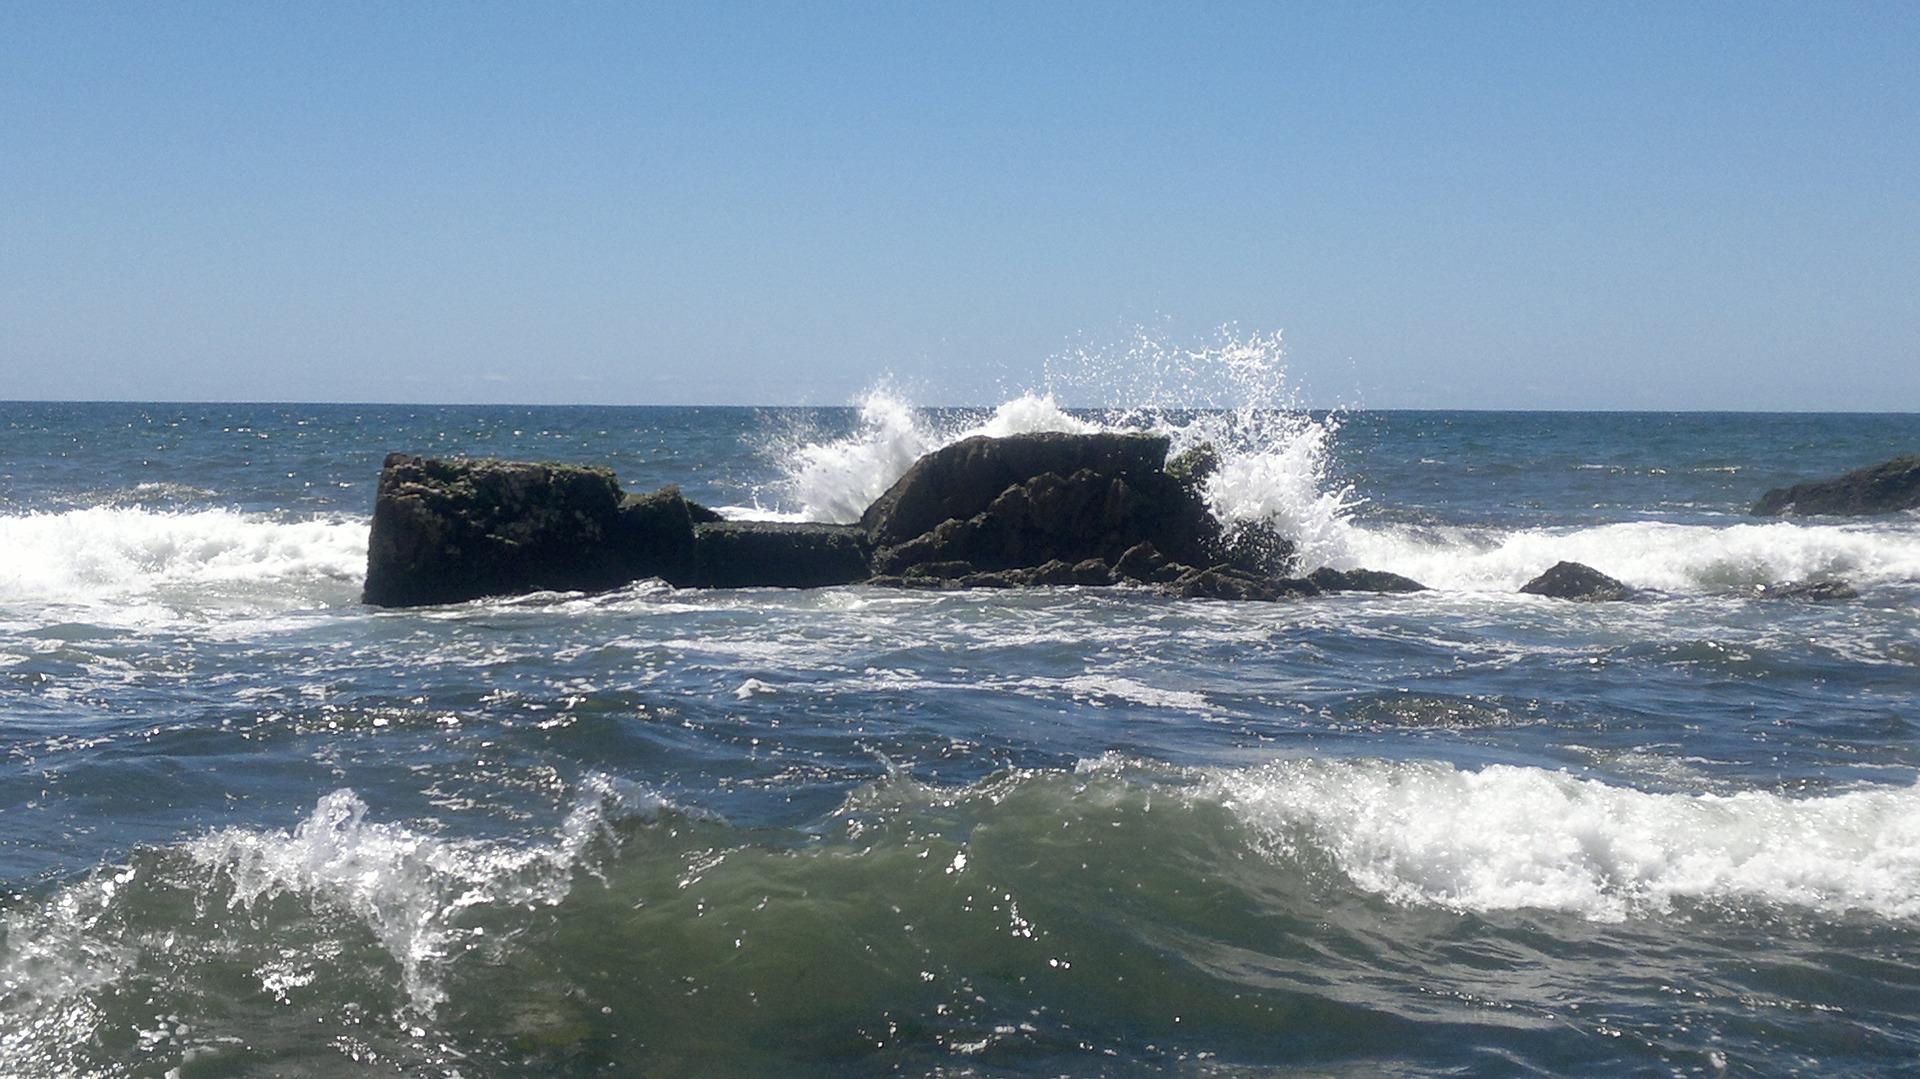 Waves crashing on the beaches of Punta del Este